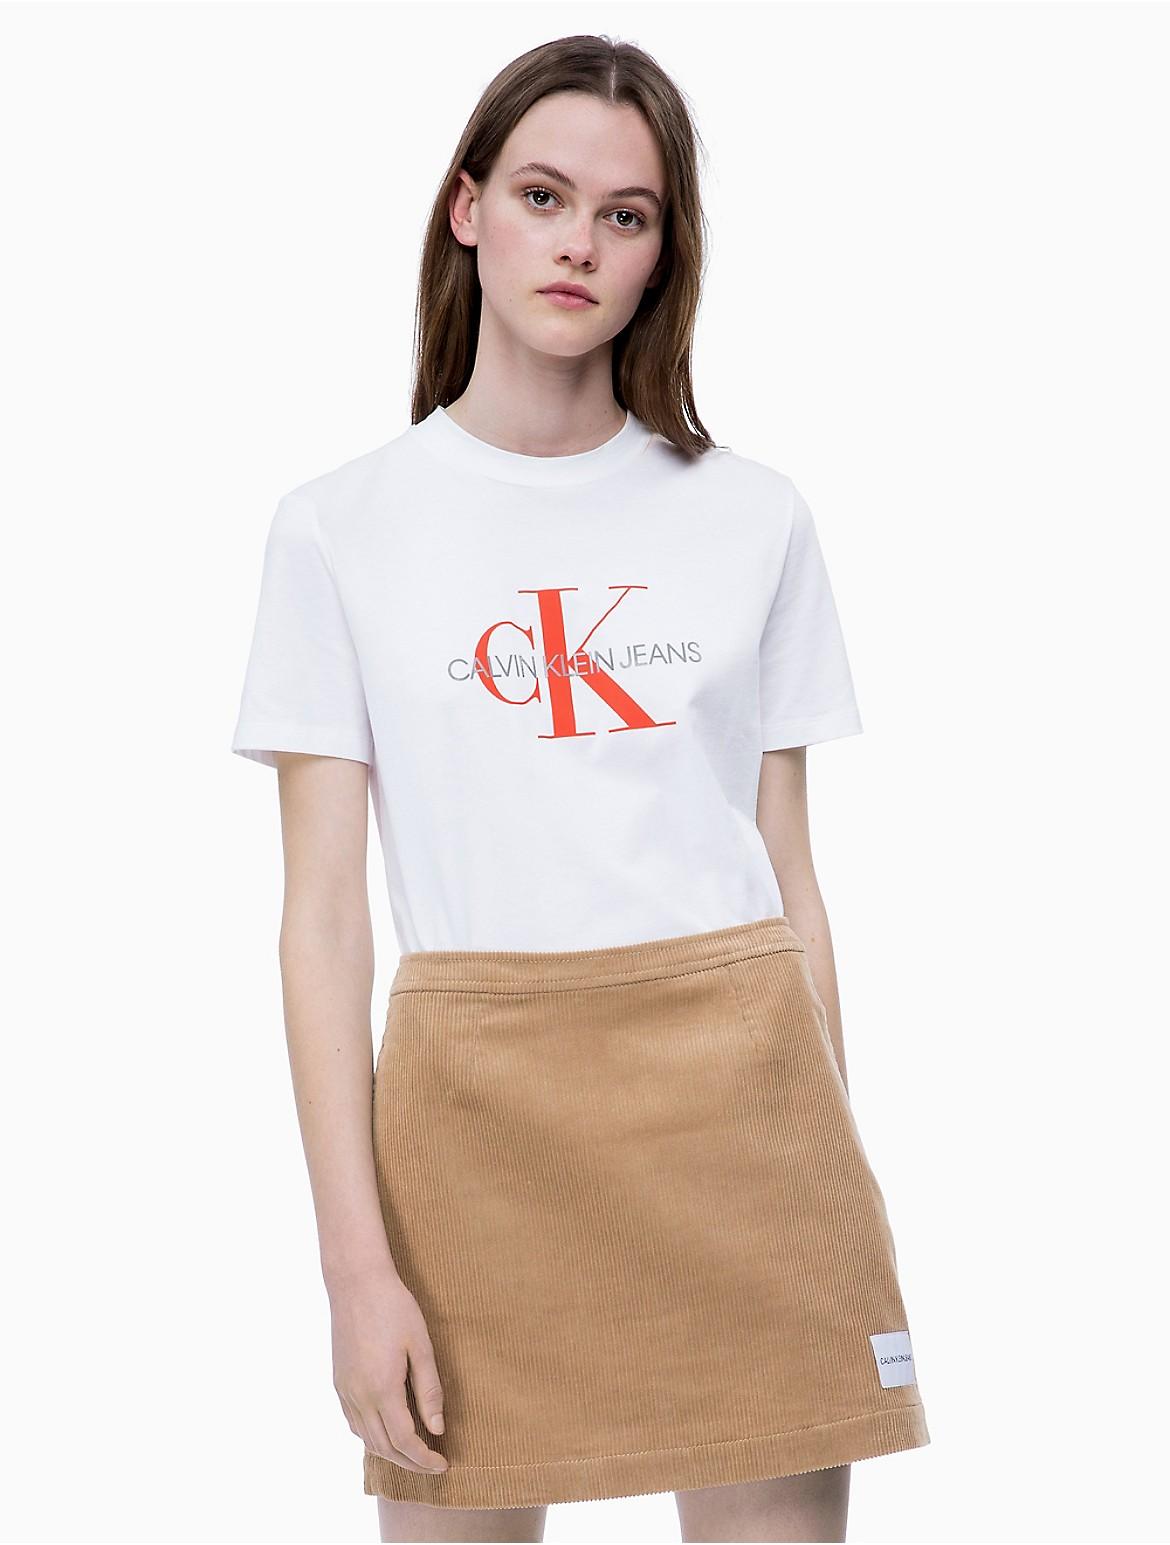 Womens Clothing Apparel